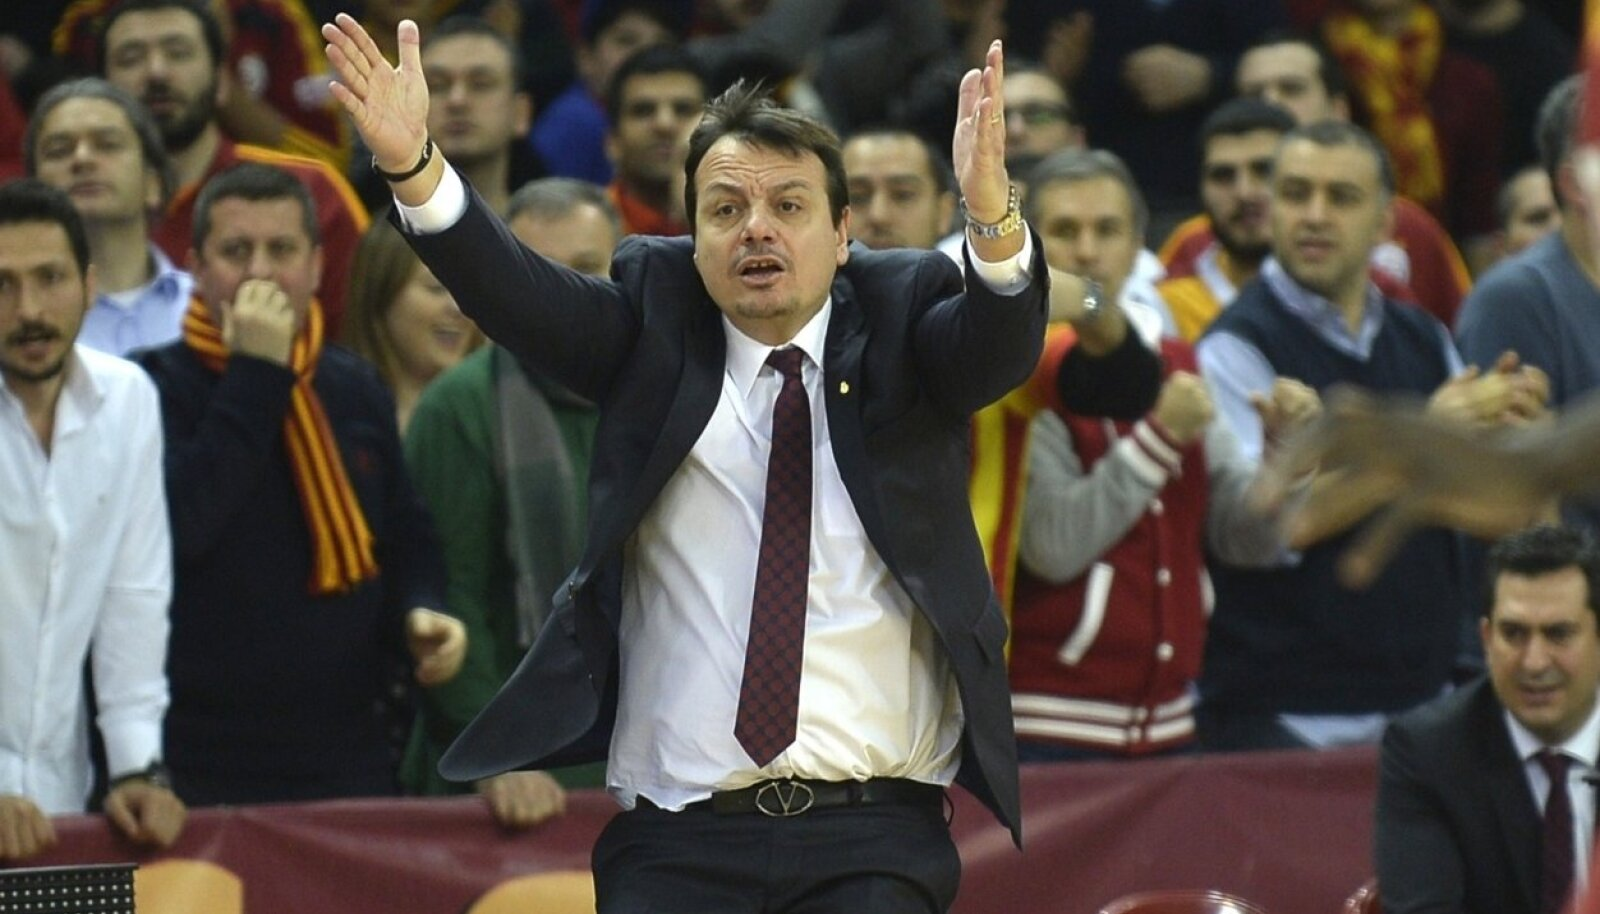 Galatasaray korvpallimeeskonna peatreener Ergin Ataman